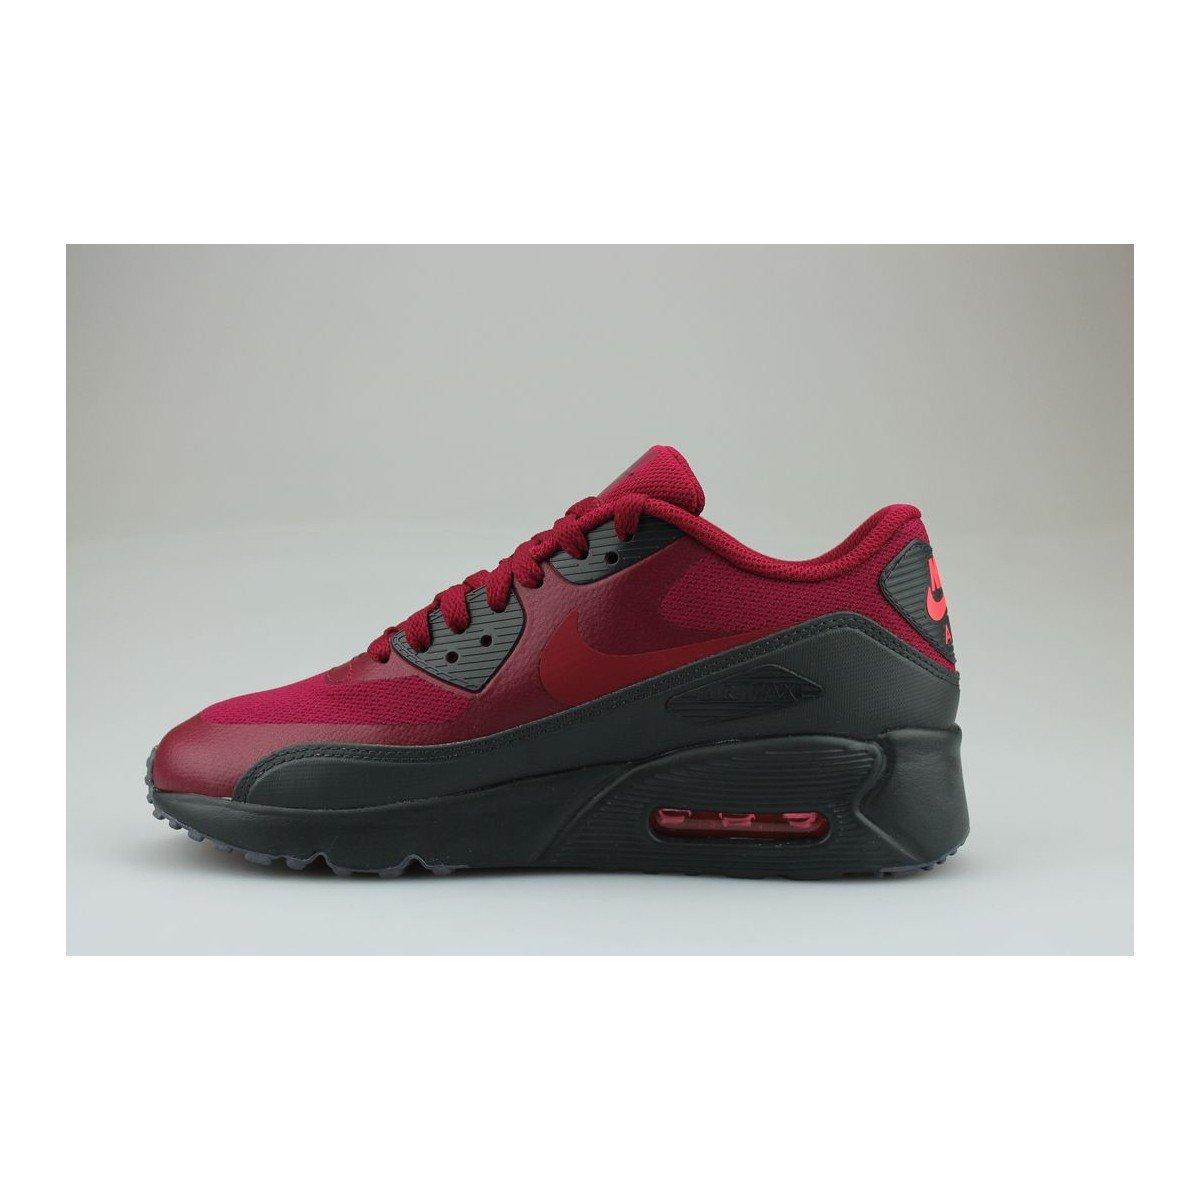 cheap for discount 9e797 a7d83 Nike Air Max 90 Ultra 2.0 Junior Rouge  Amazon.fr  Chaussures et Sacs